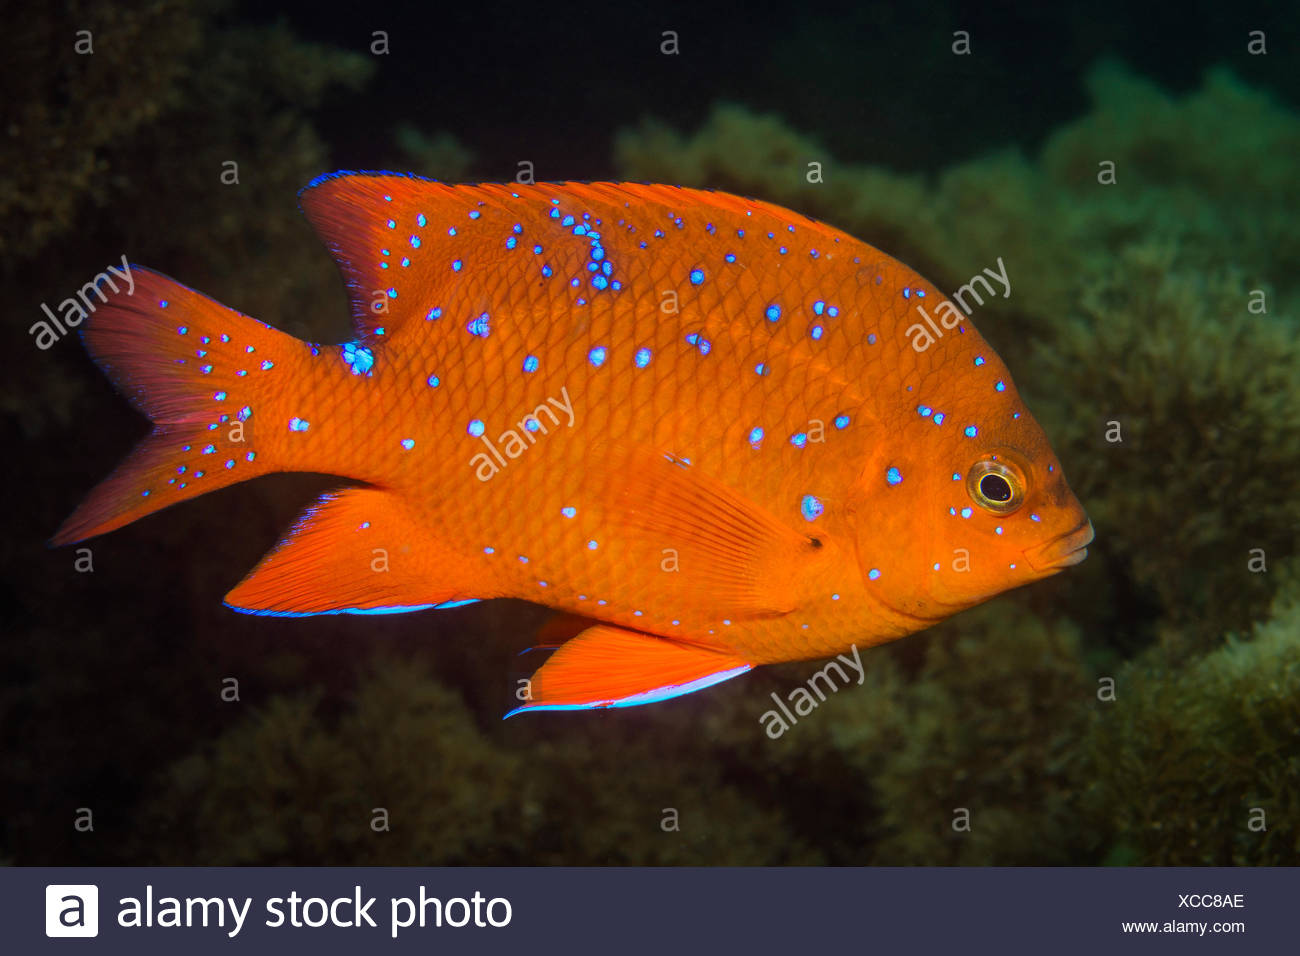 Garibaldi, peces juveniles hypsypops rubicundus, Catalina Island, California, EE.UU. Imagen De Stock